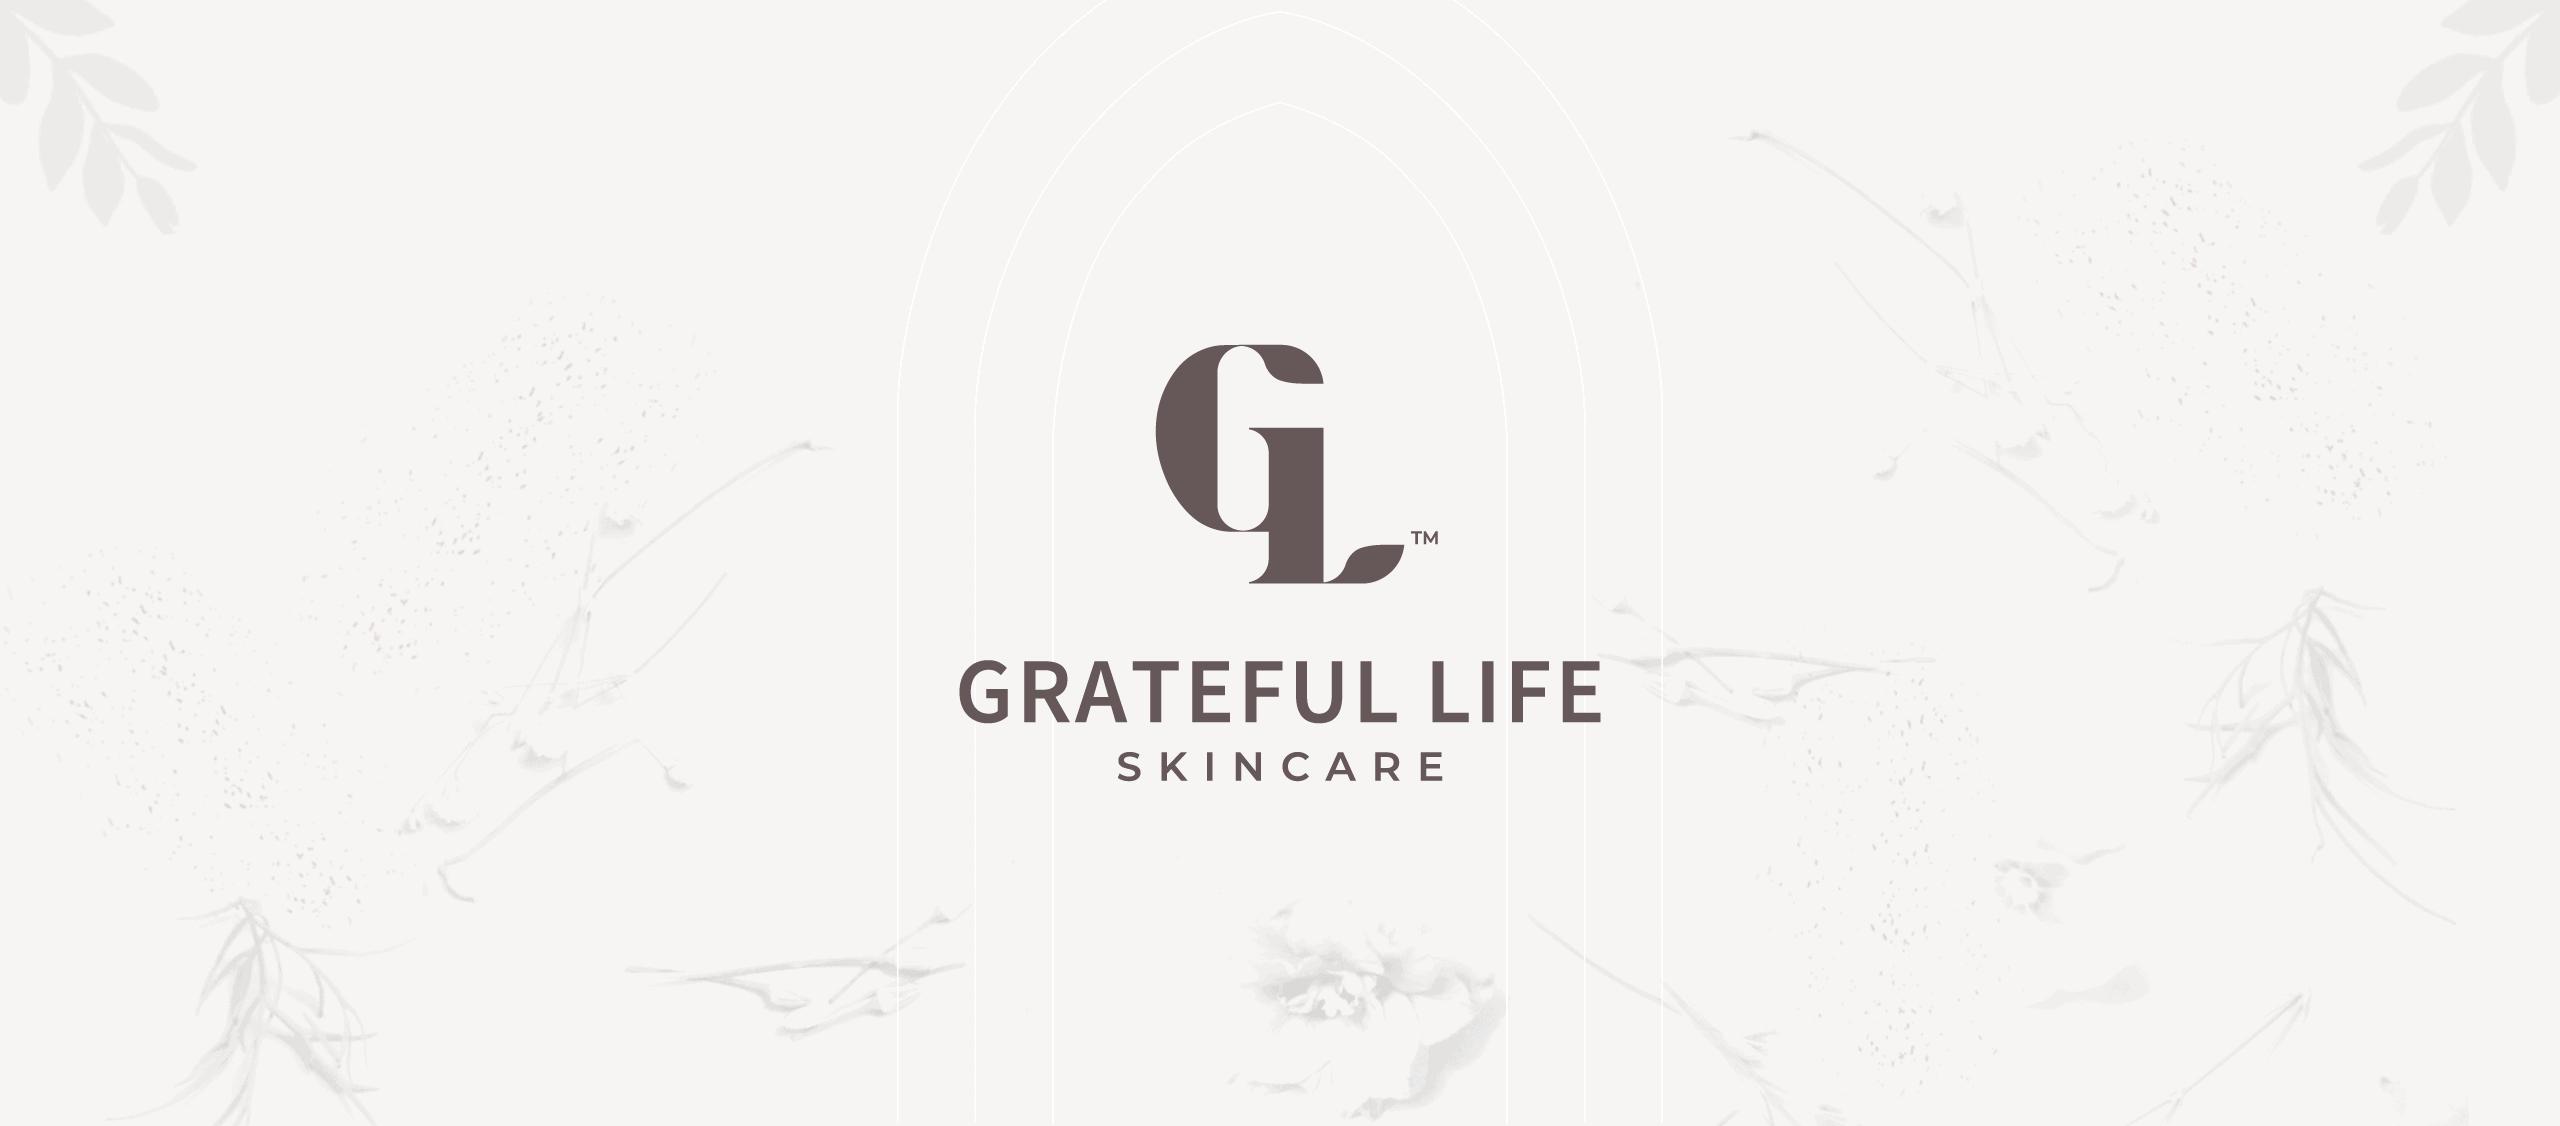 Grateful Life Skincare Logo Design